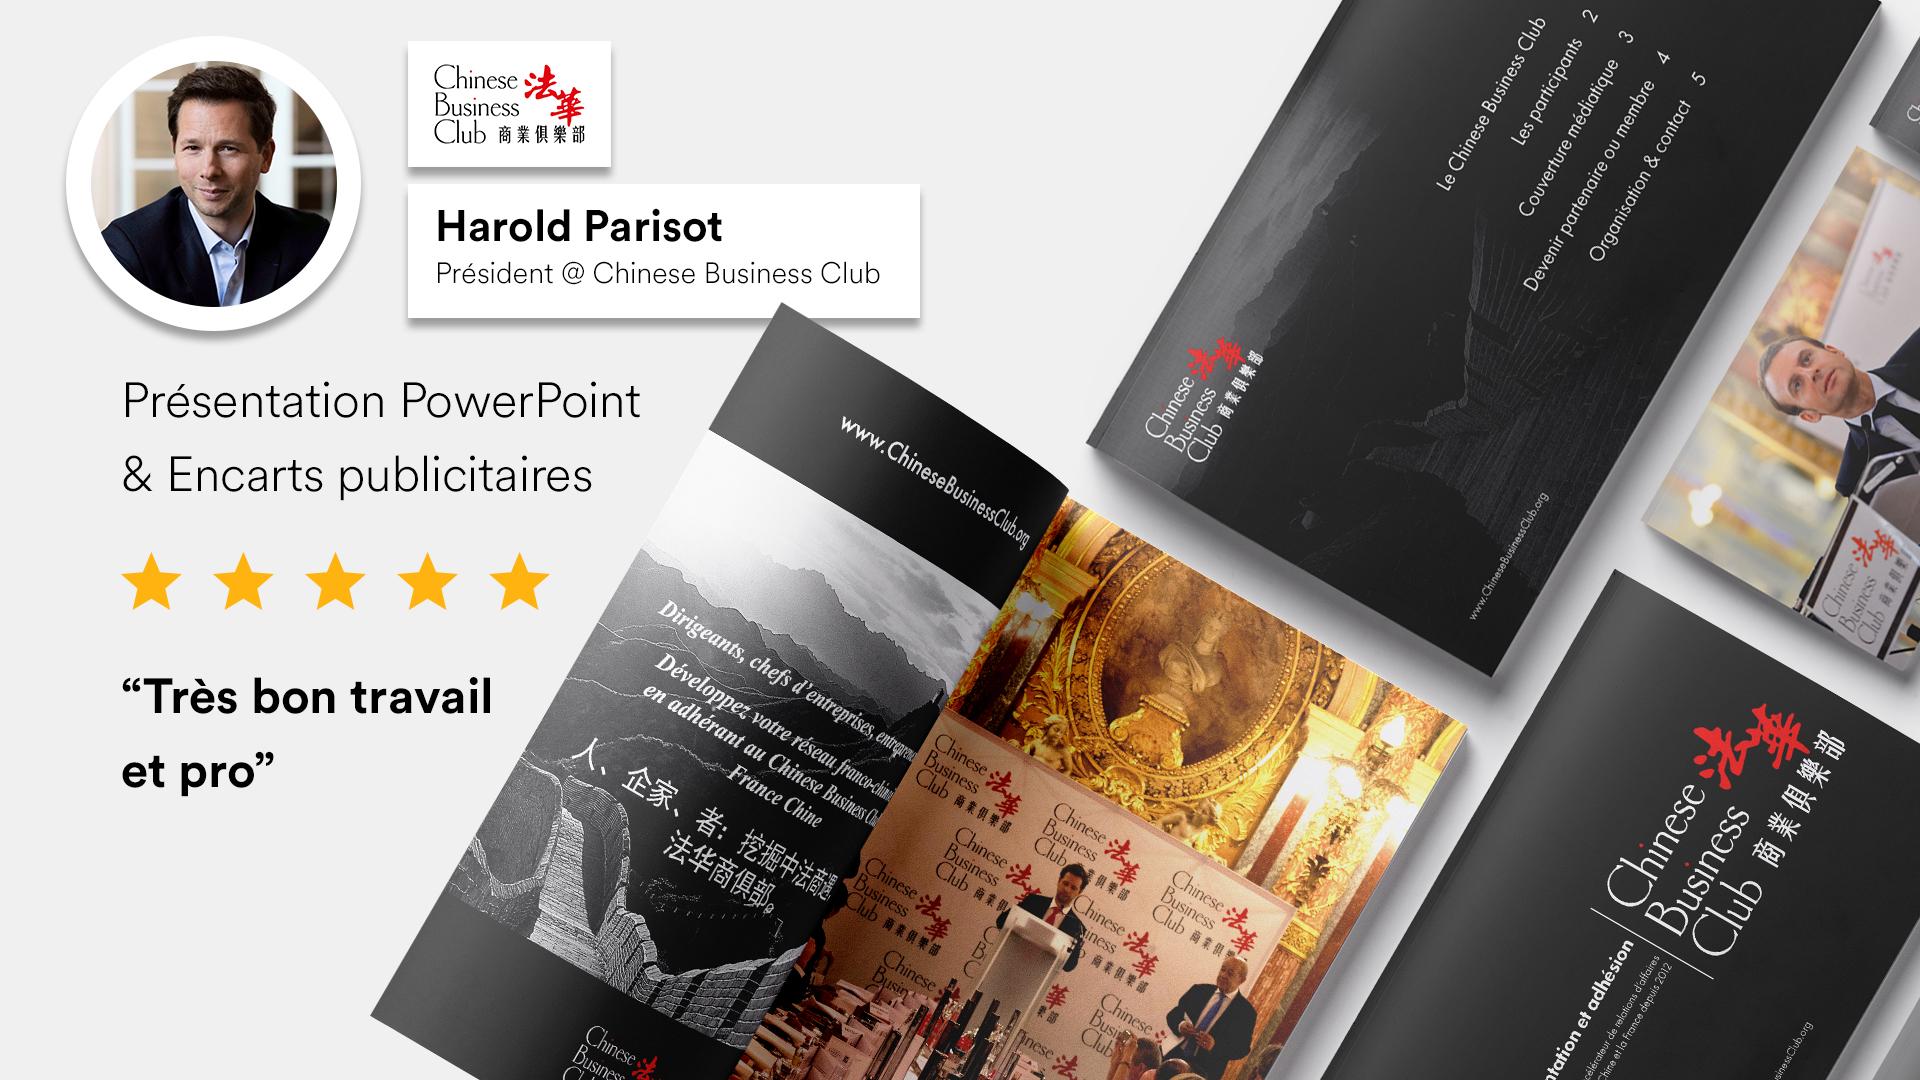 Harold-Parisot-cbc